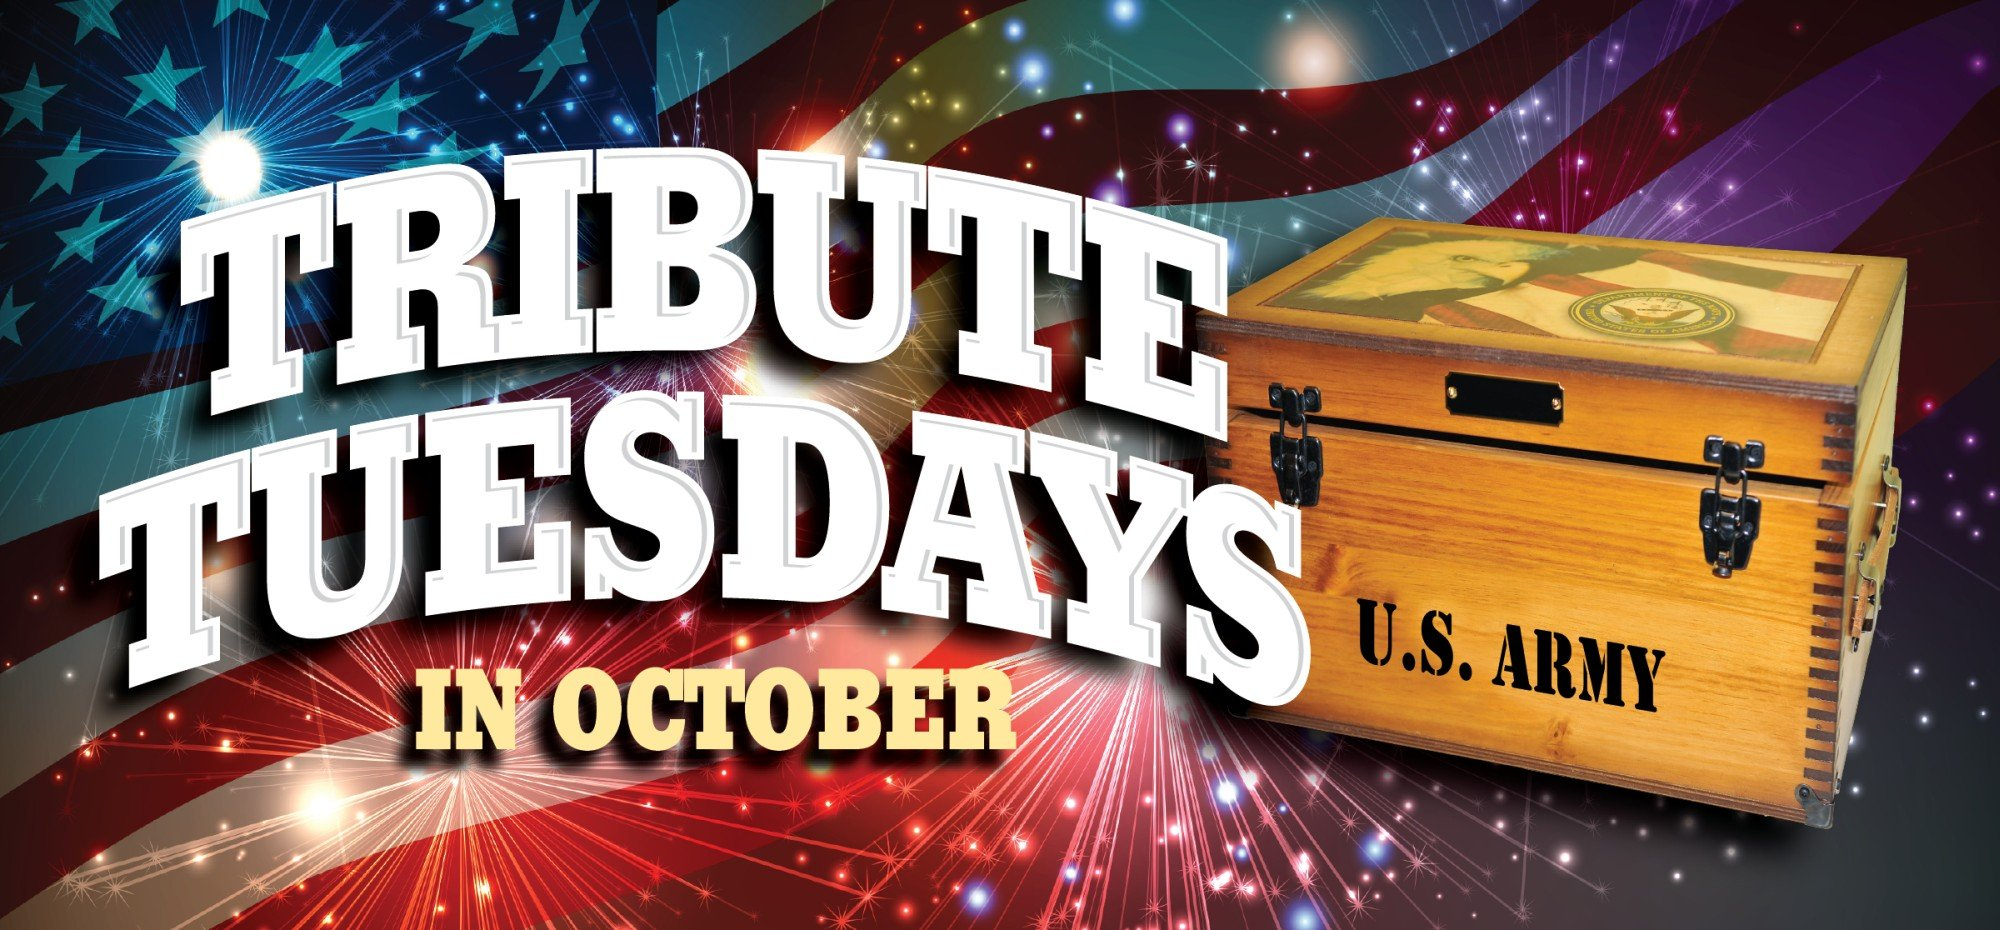 Web Header Promotion - October Tribute Tuesdays